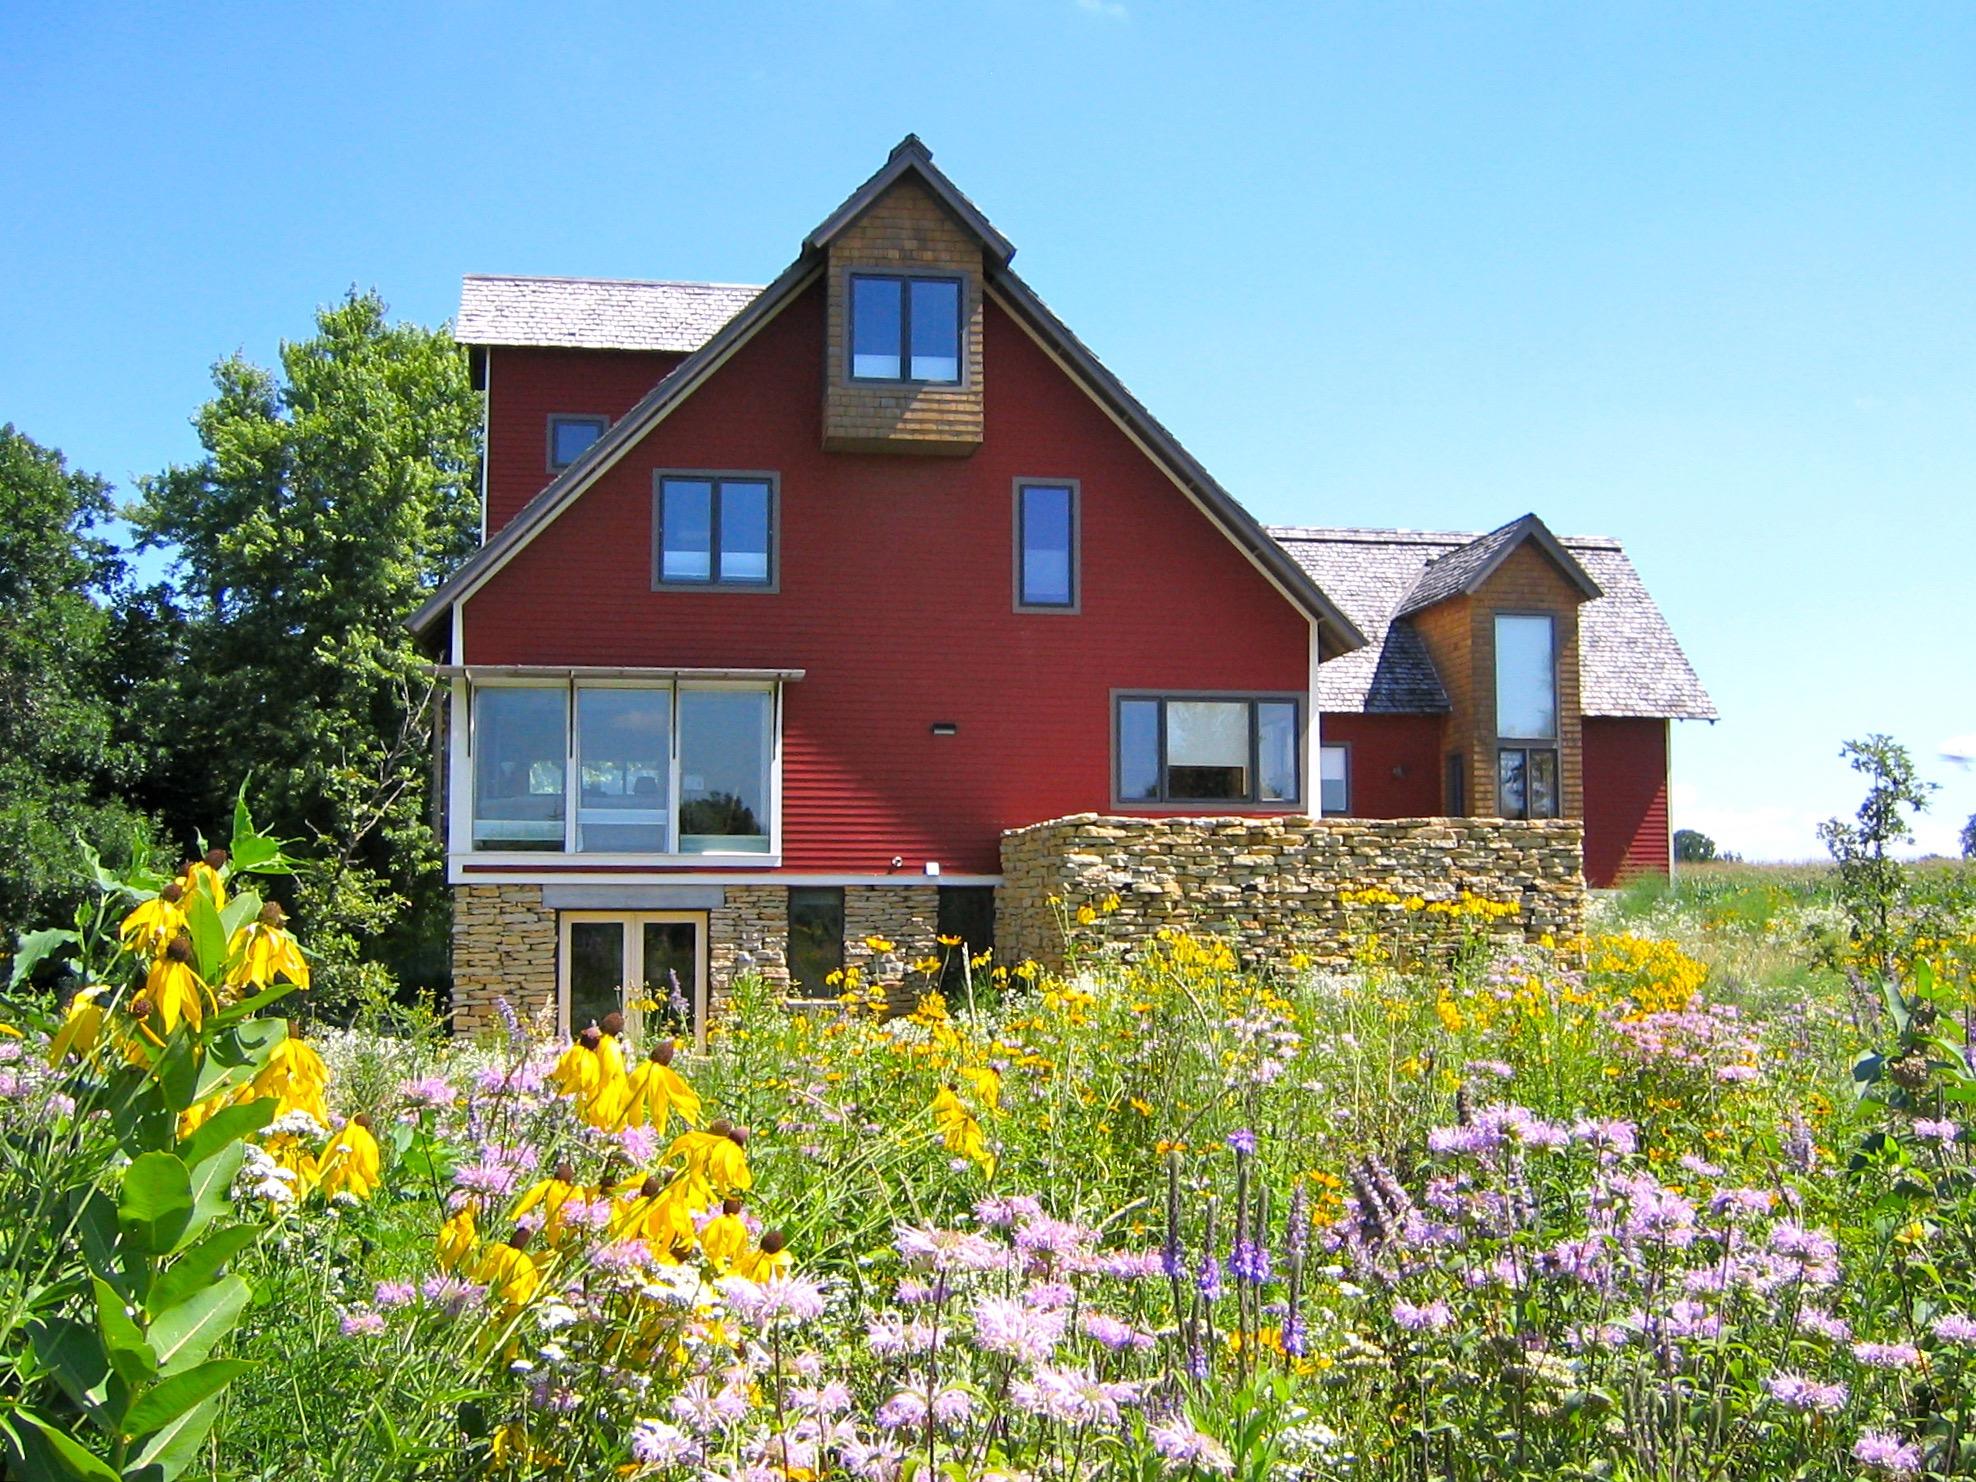 FARM HOUSE & LUTHIER STUDIO